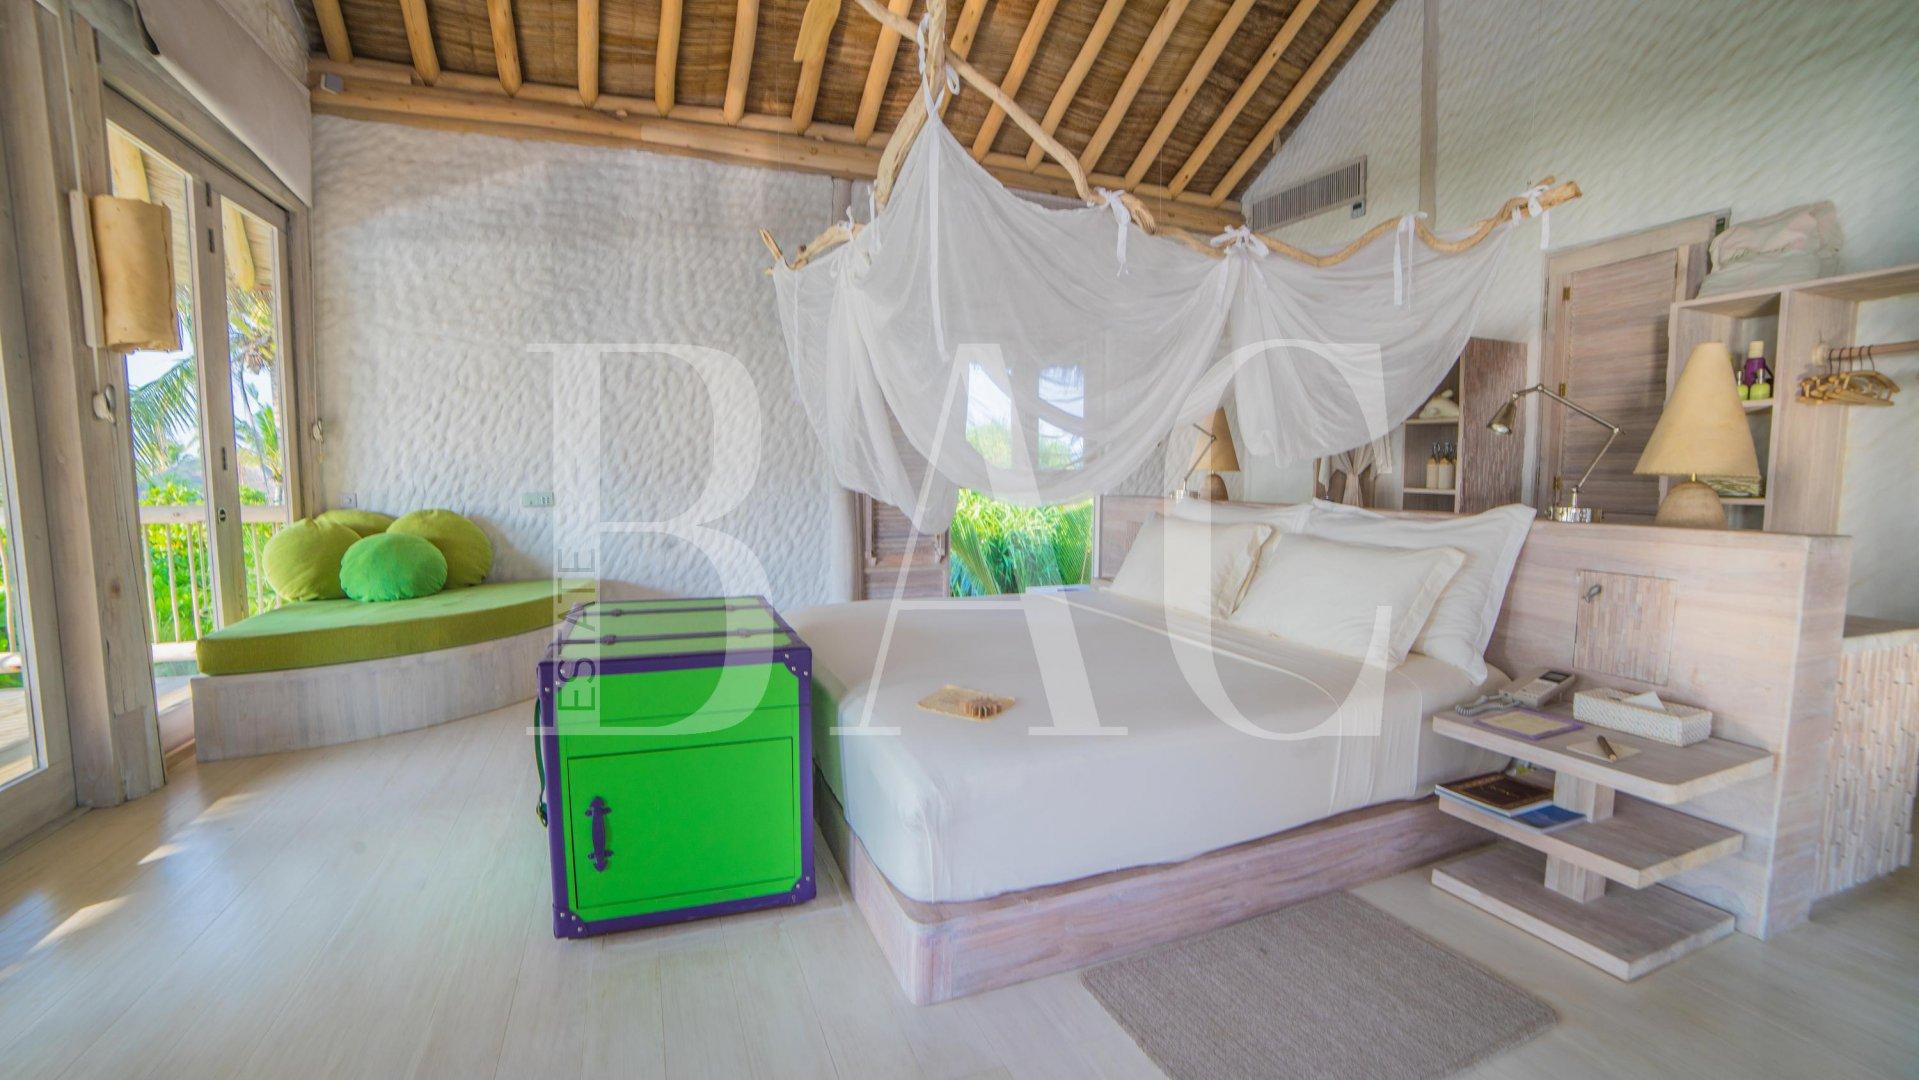 Villa on an island in the Maldives